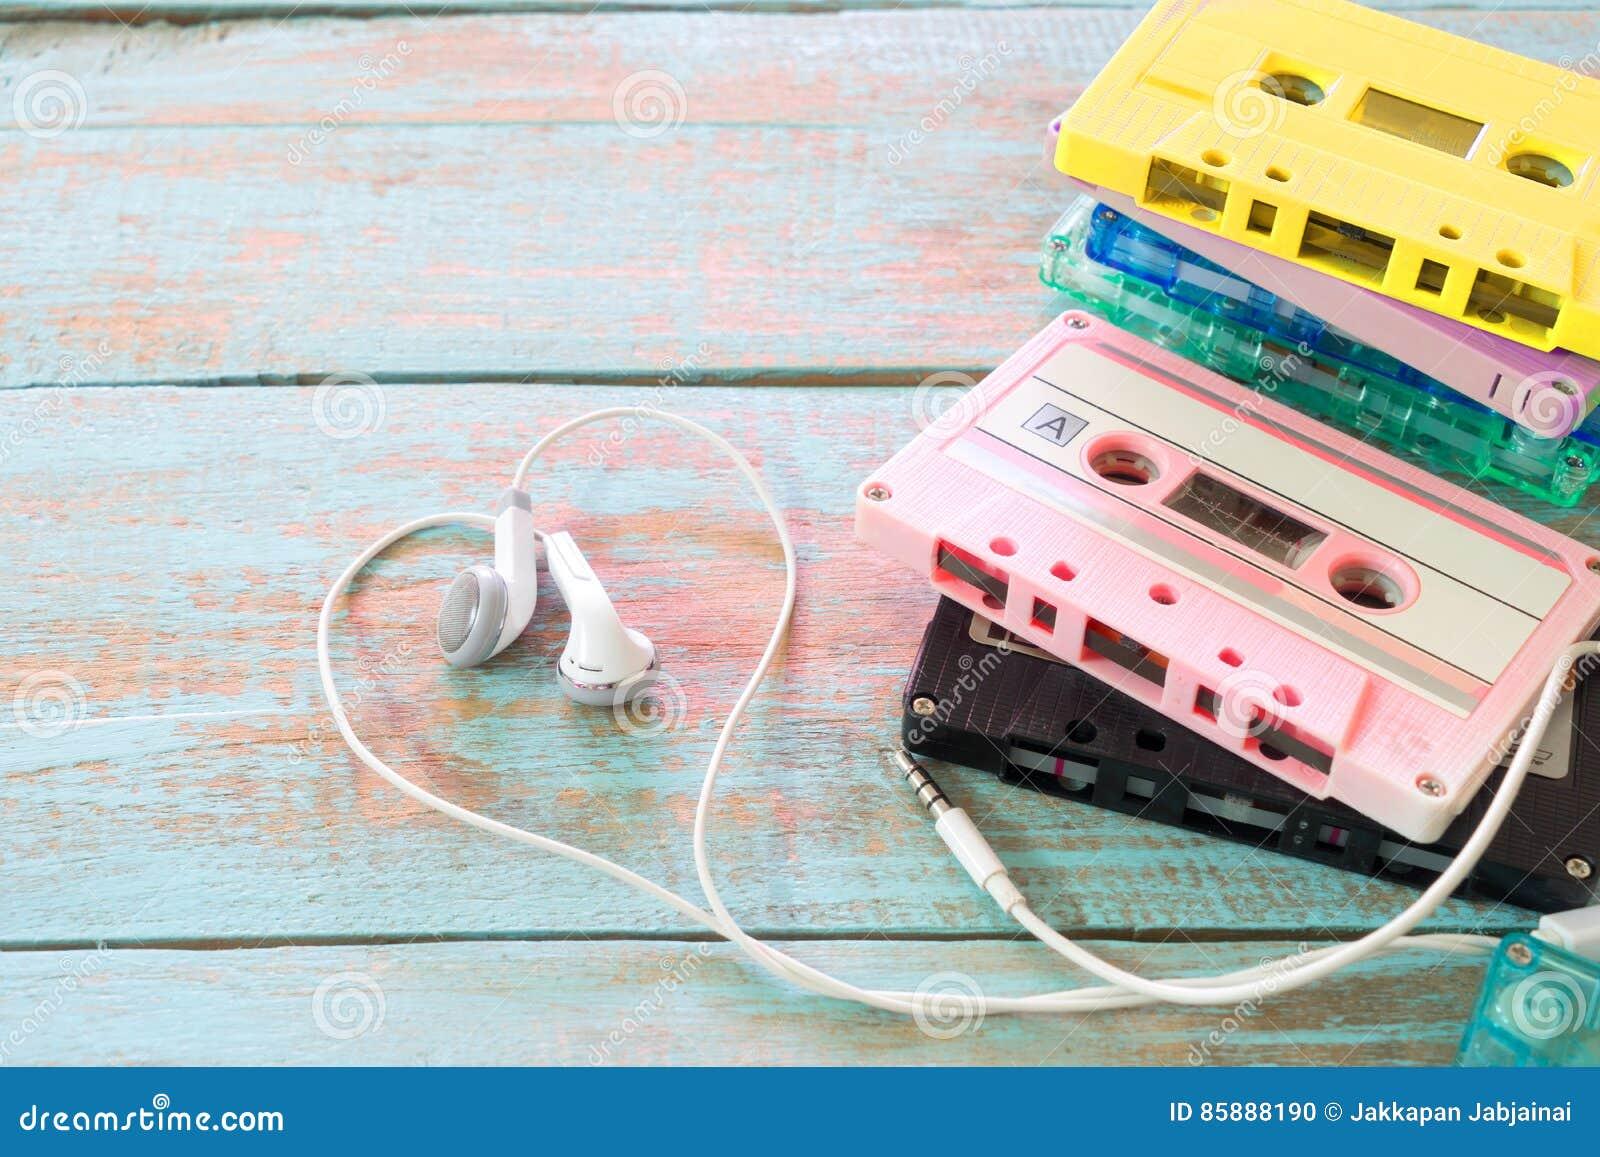 Retro tape cassette with earphone heart shape on wood table.